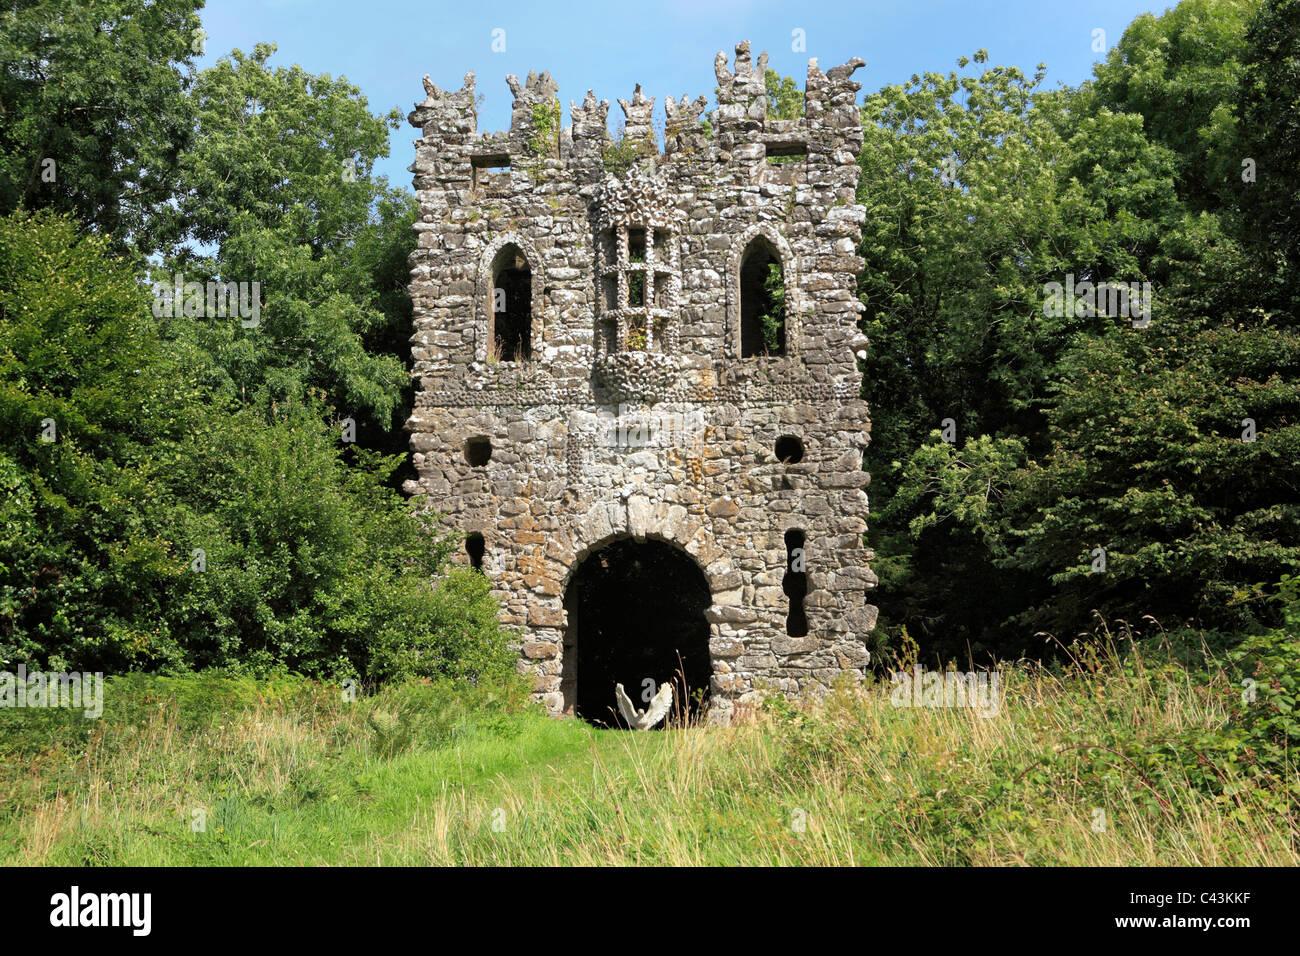 Eire, Europe, European, Ireland, Irish, Western Europe, travel destinations, Architecture, building, houses, Landscape, - Stock Image